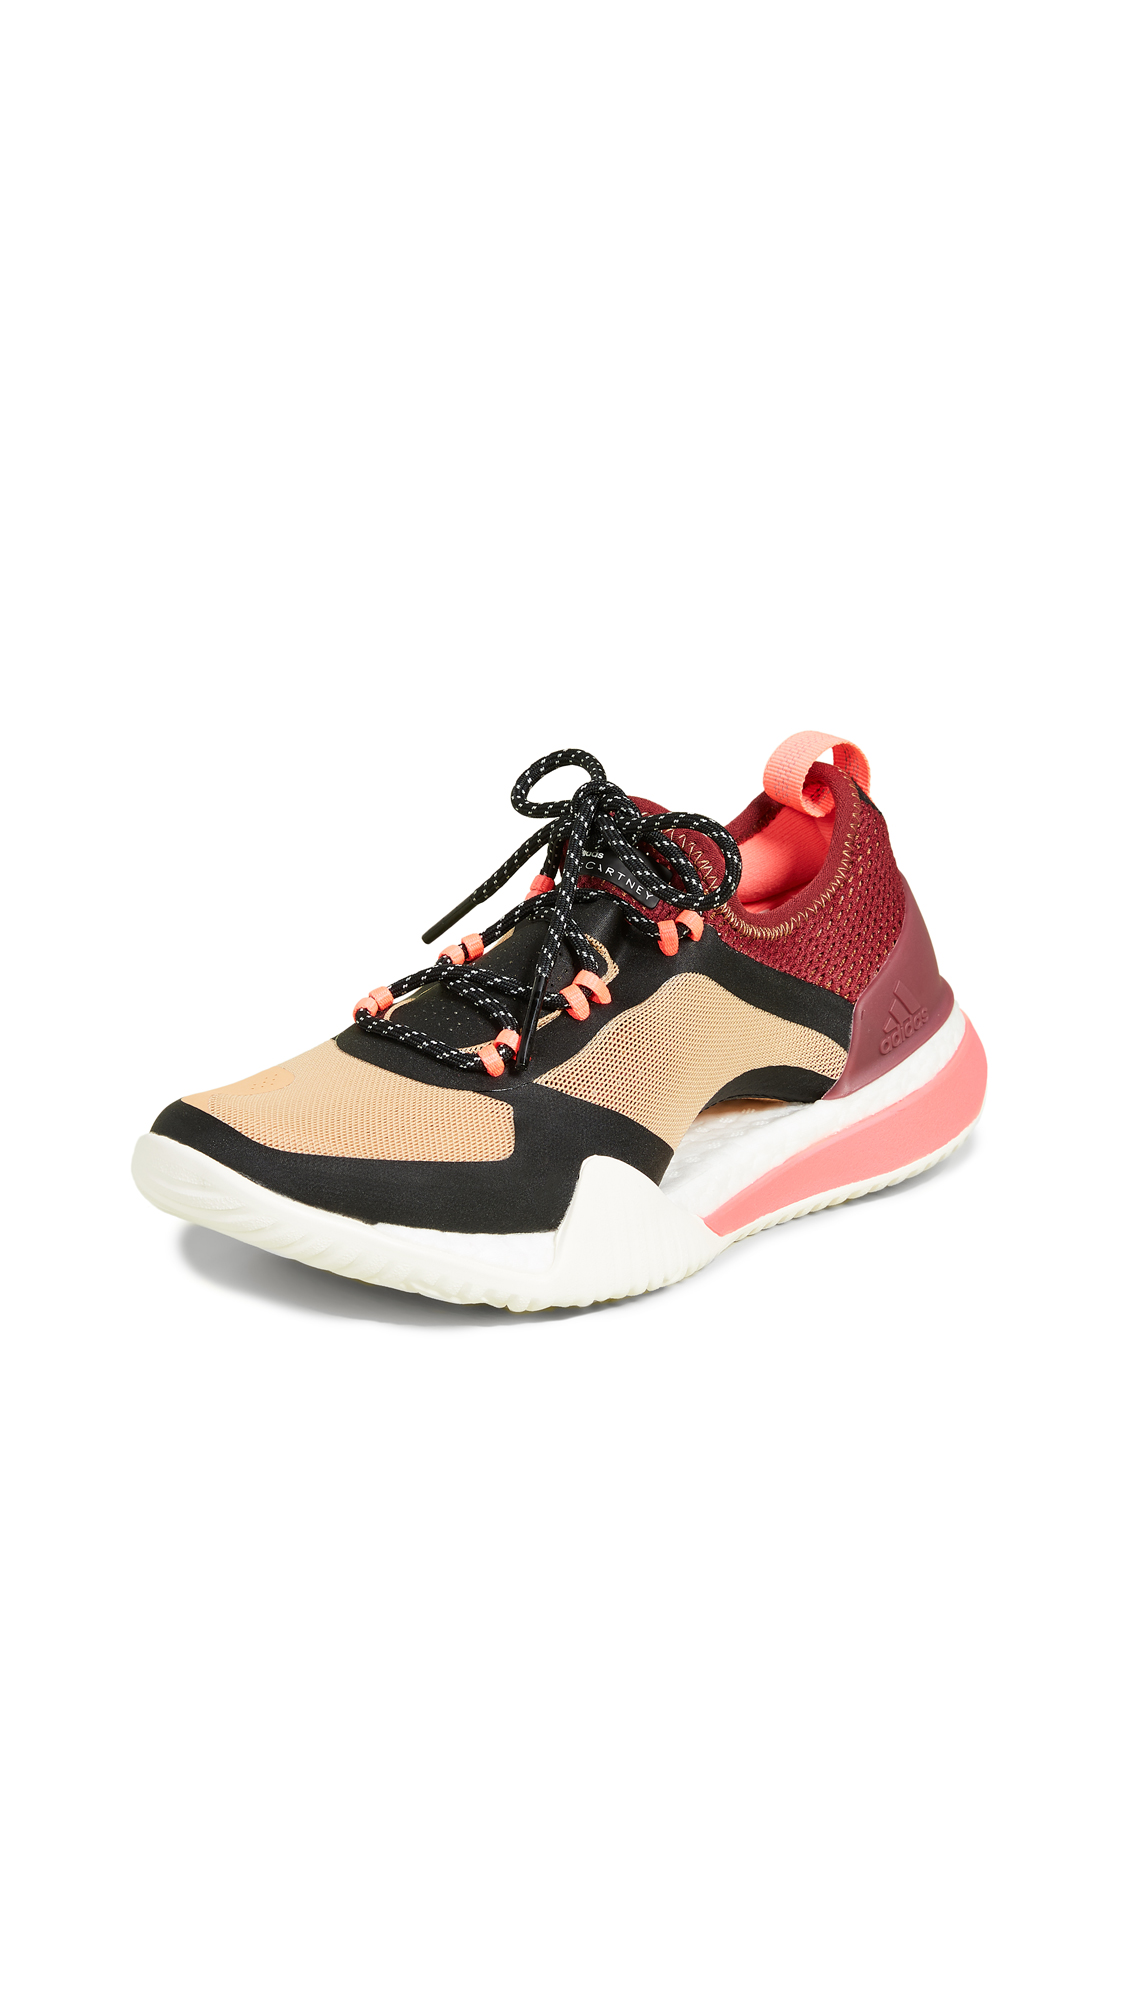 adidas by Stella McCartney PureBOOST X TR 3.0 Sneakers - Cardboard/Maroon/Black